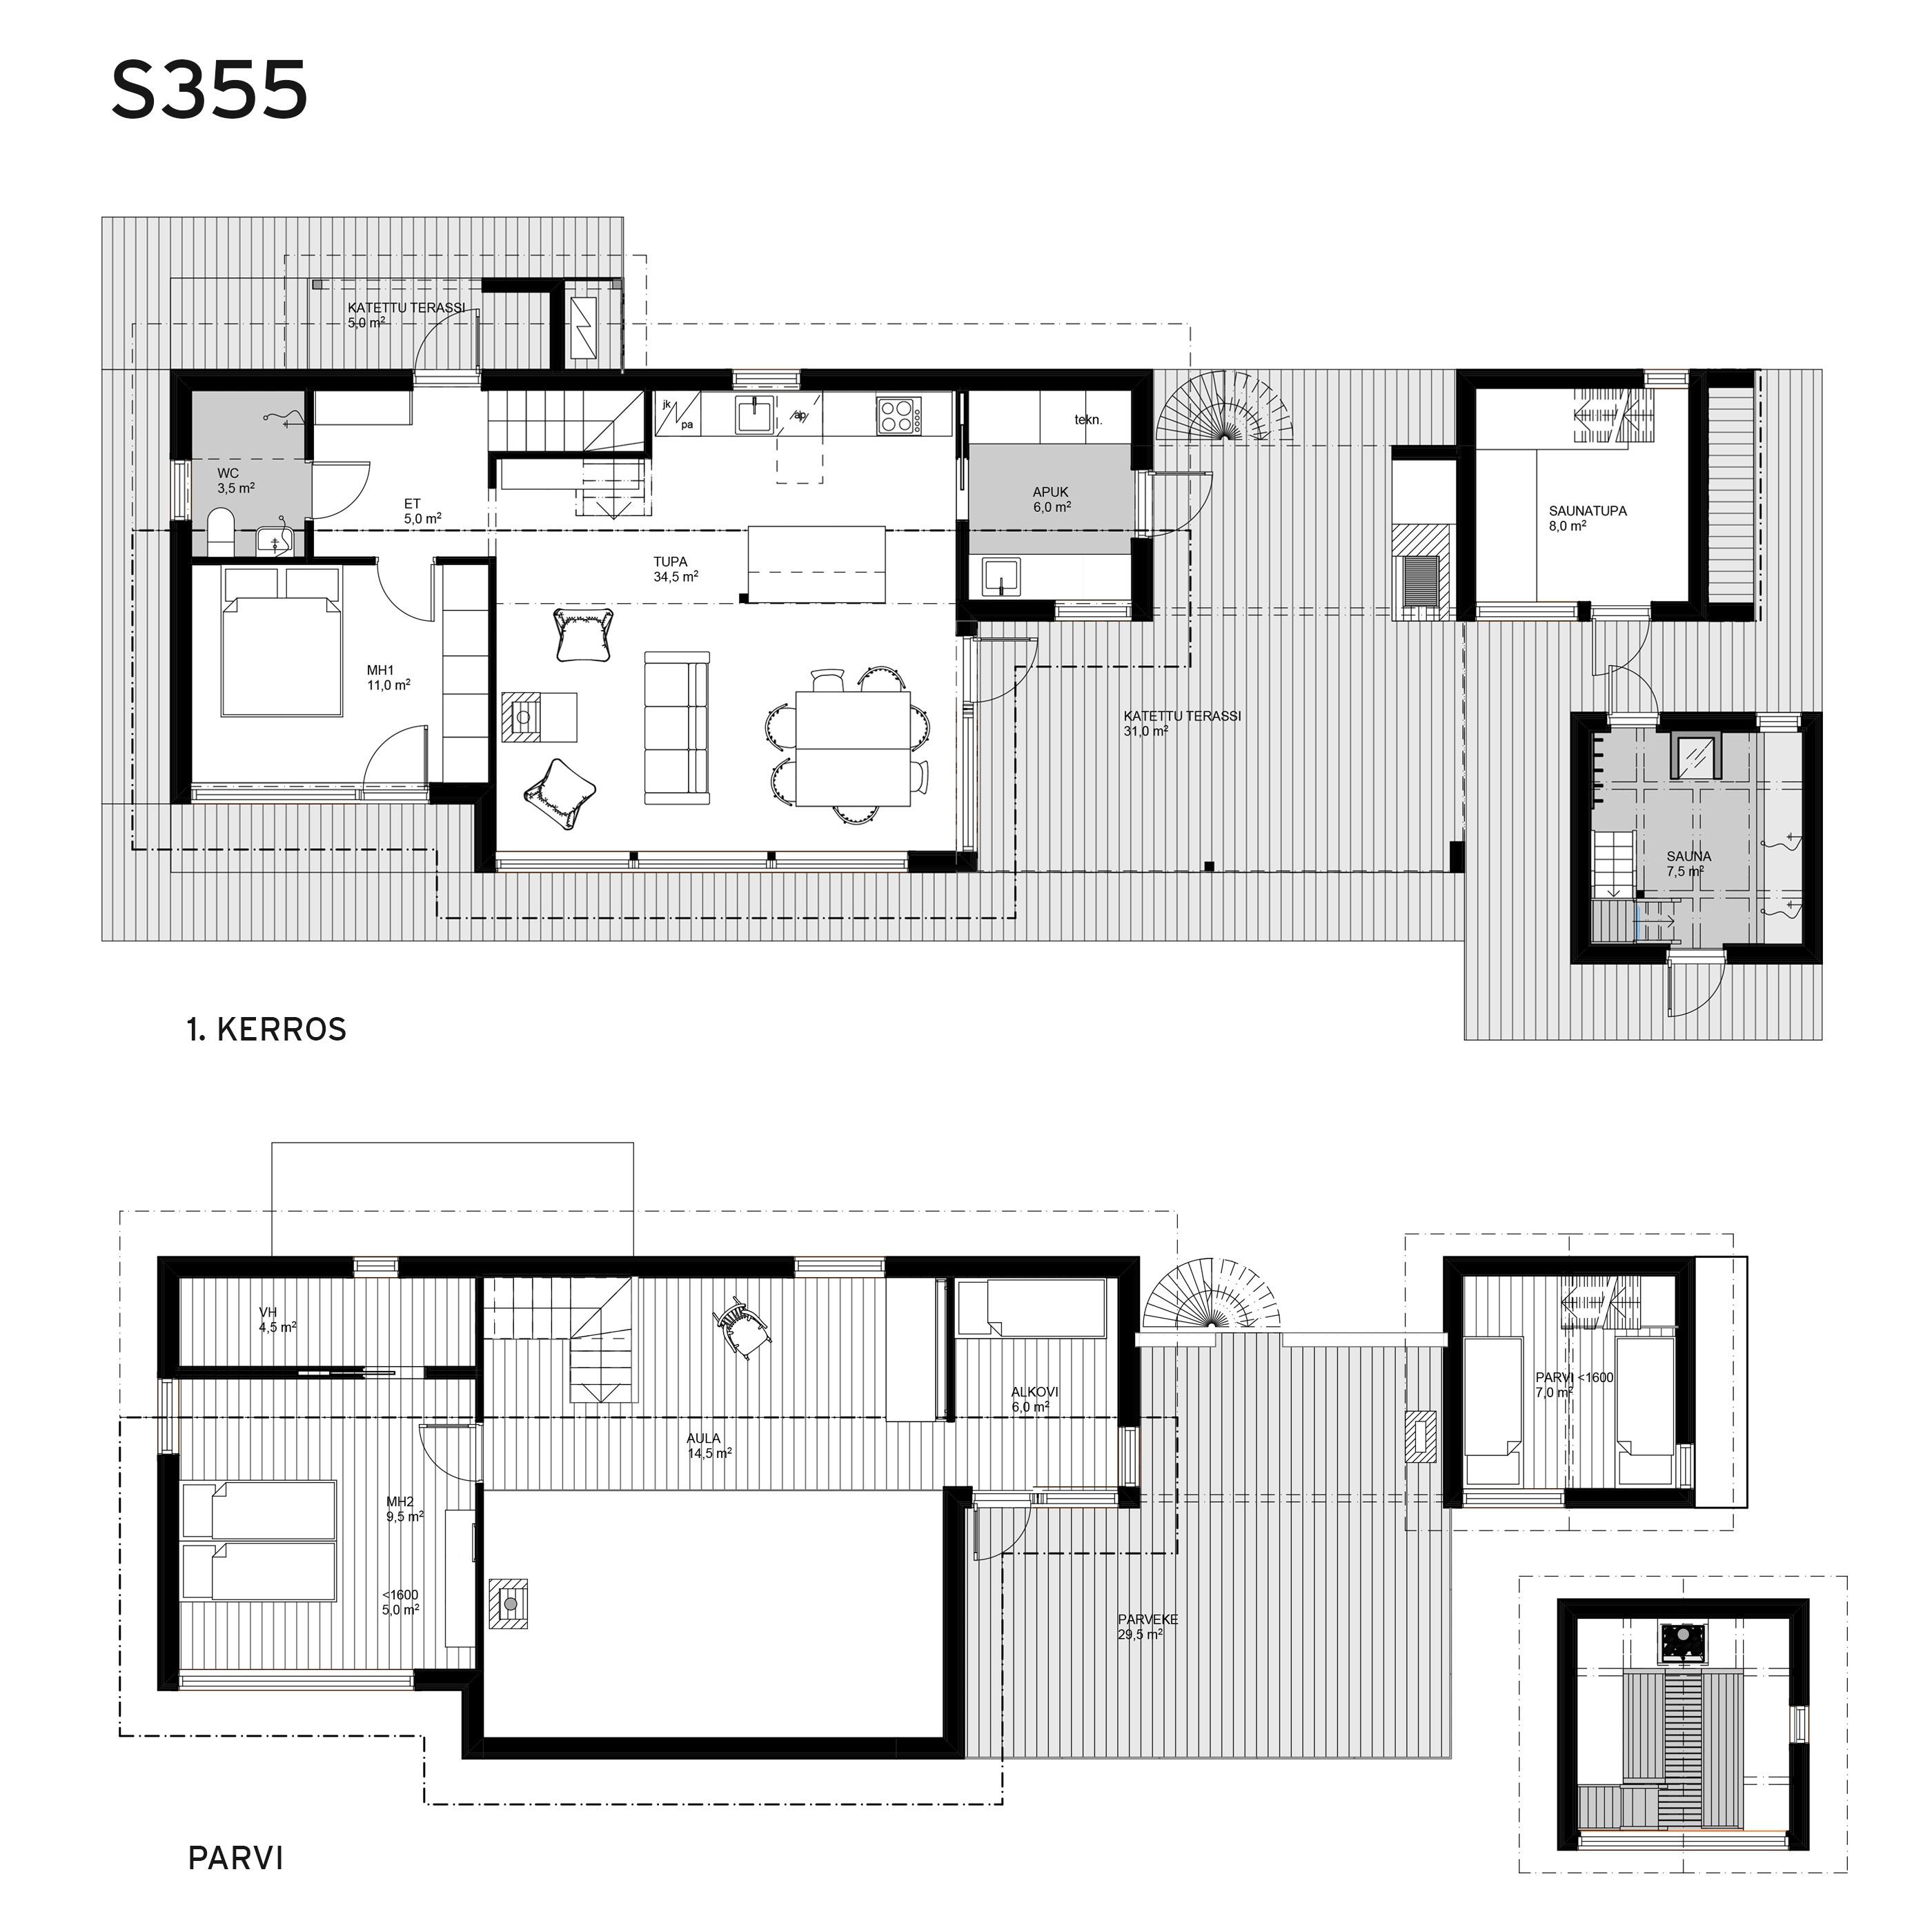 Sunhouse Linjakas talo S355 pohja_72ppi.jpg